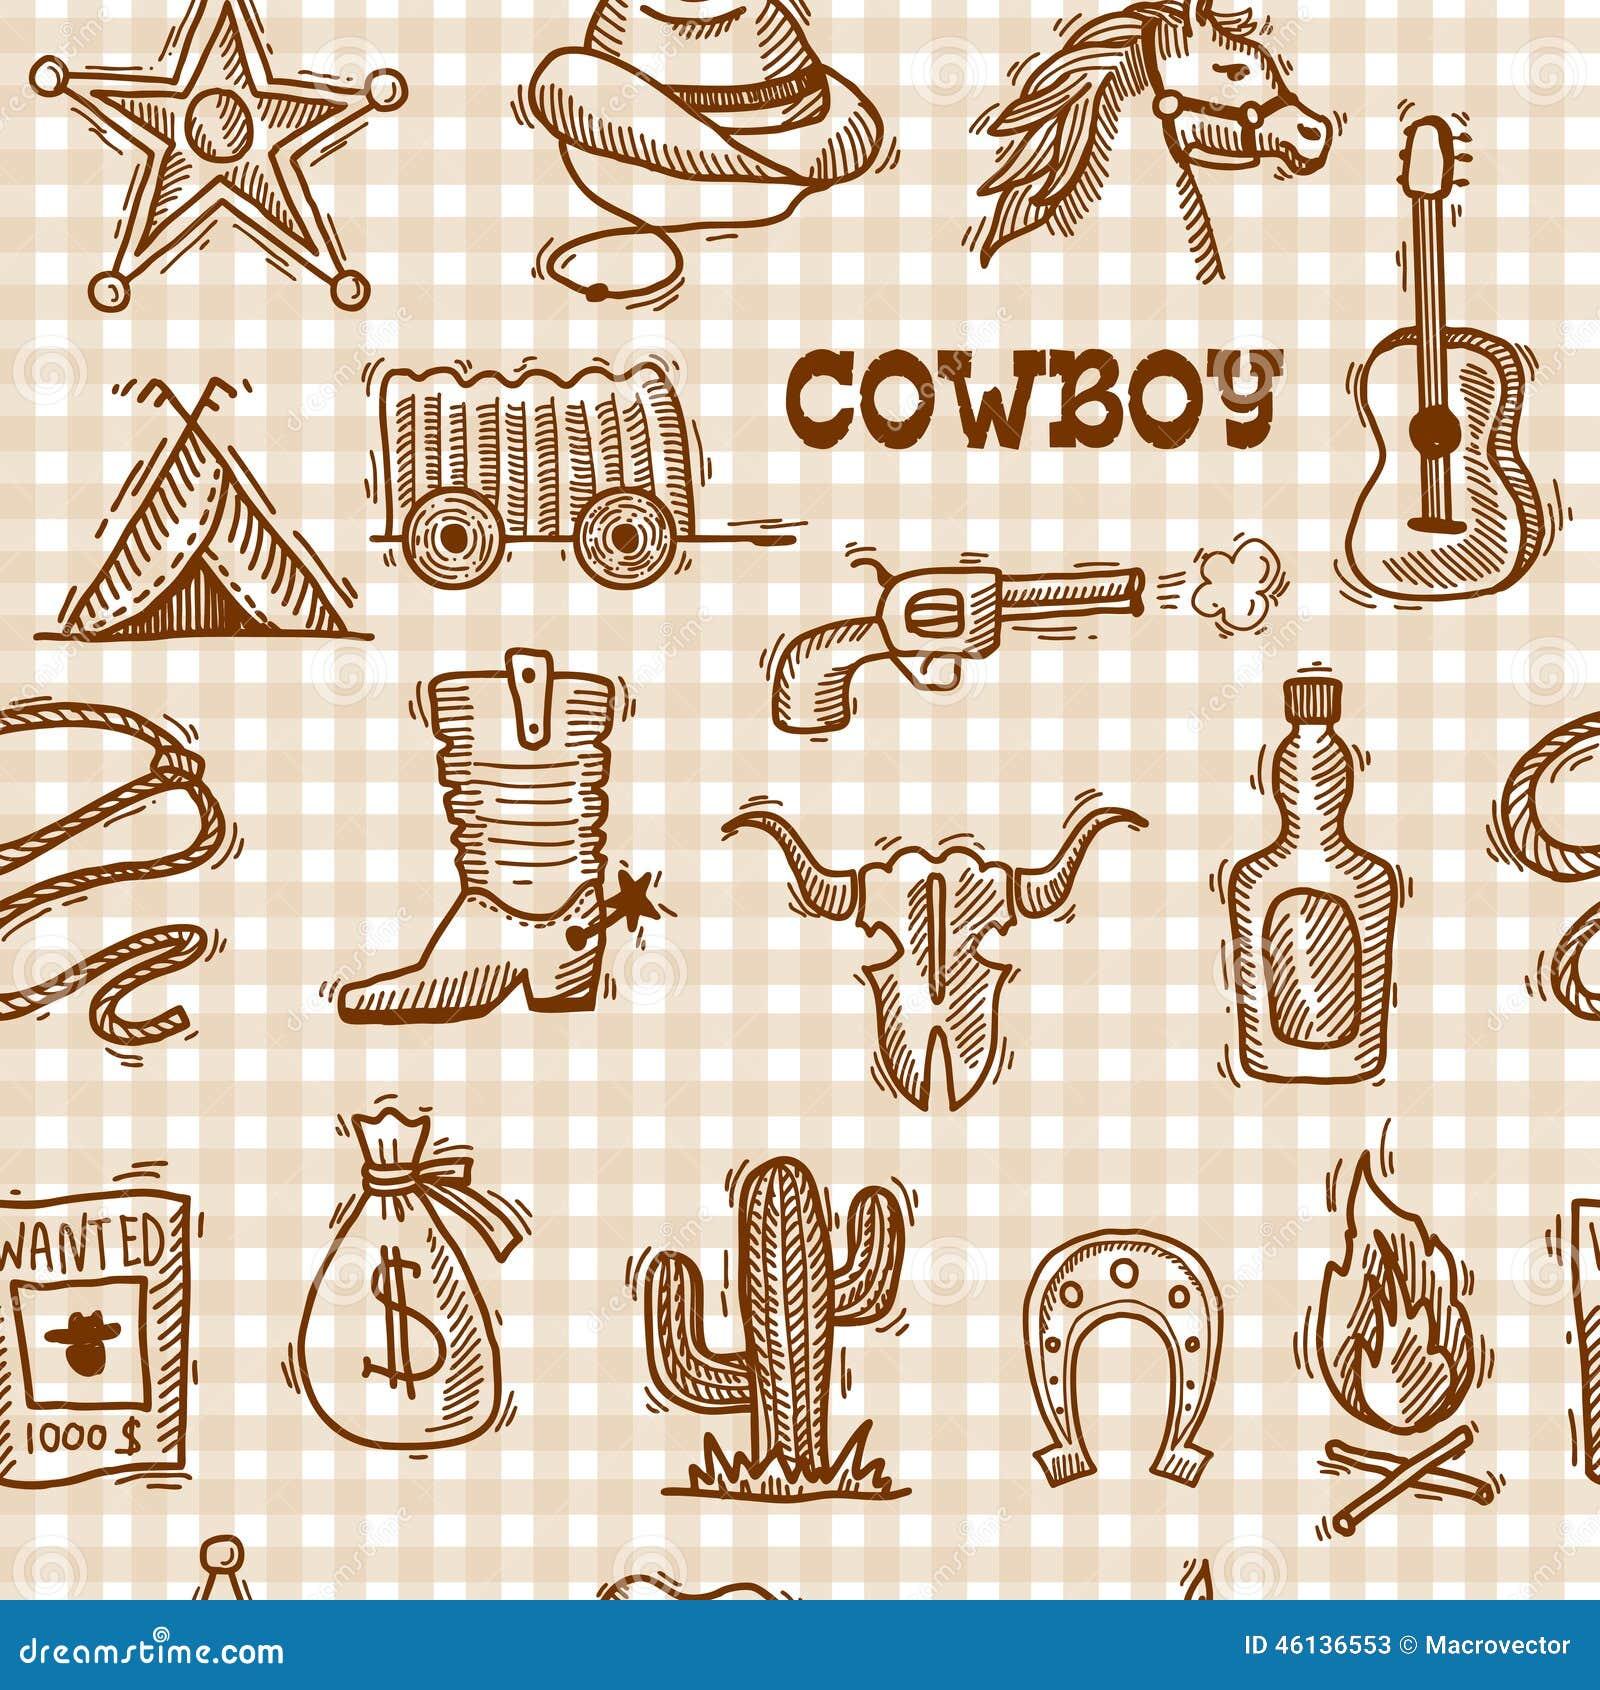 Cowboy Seamless Pattern Stock Vector - Image: 46136553